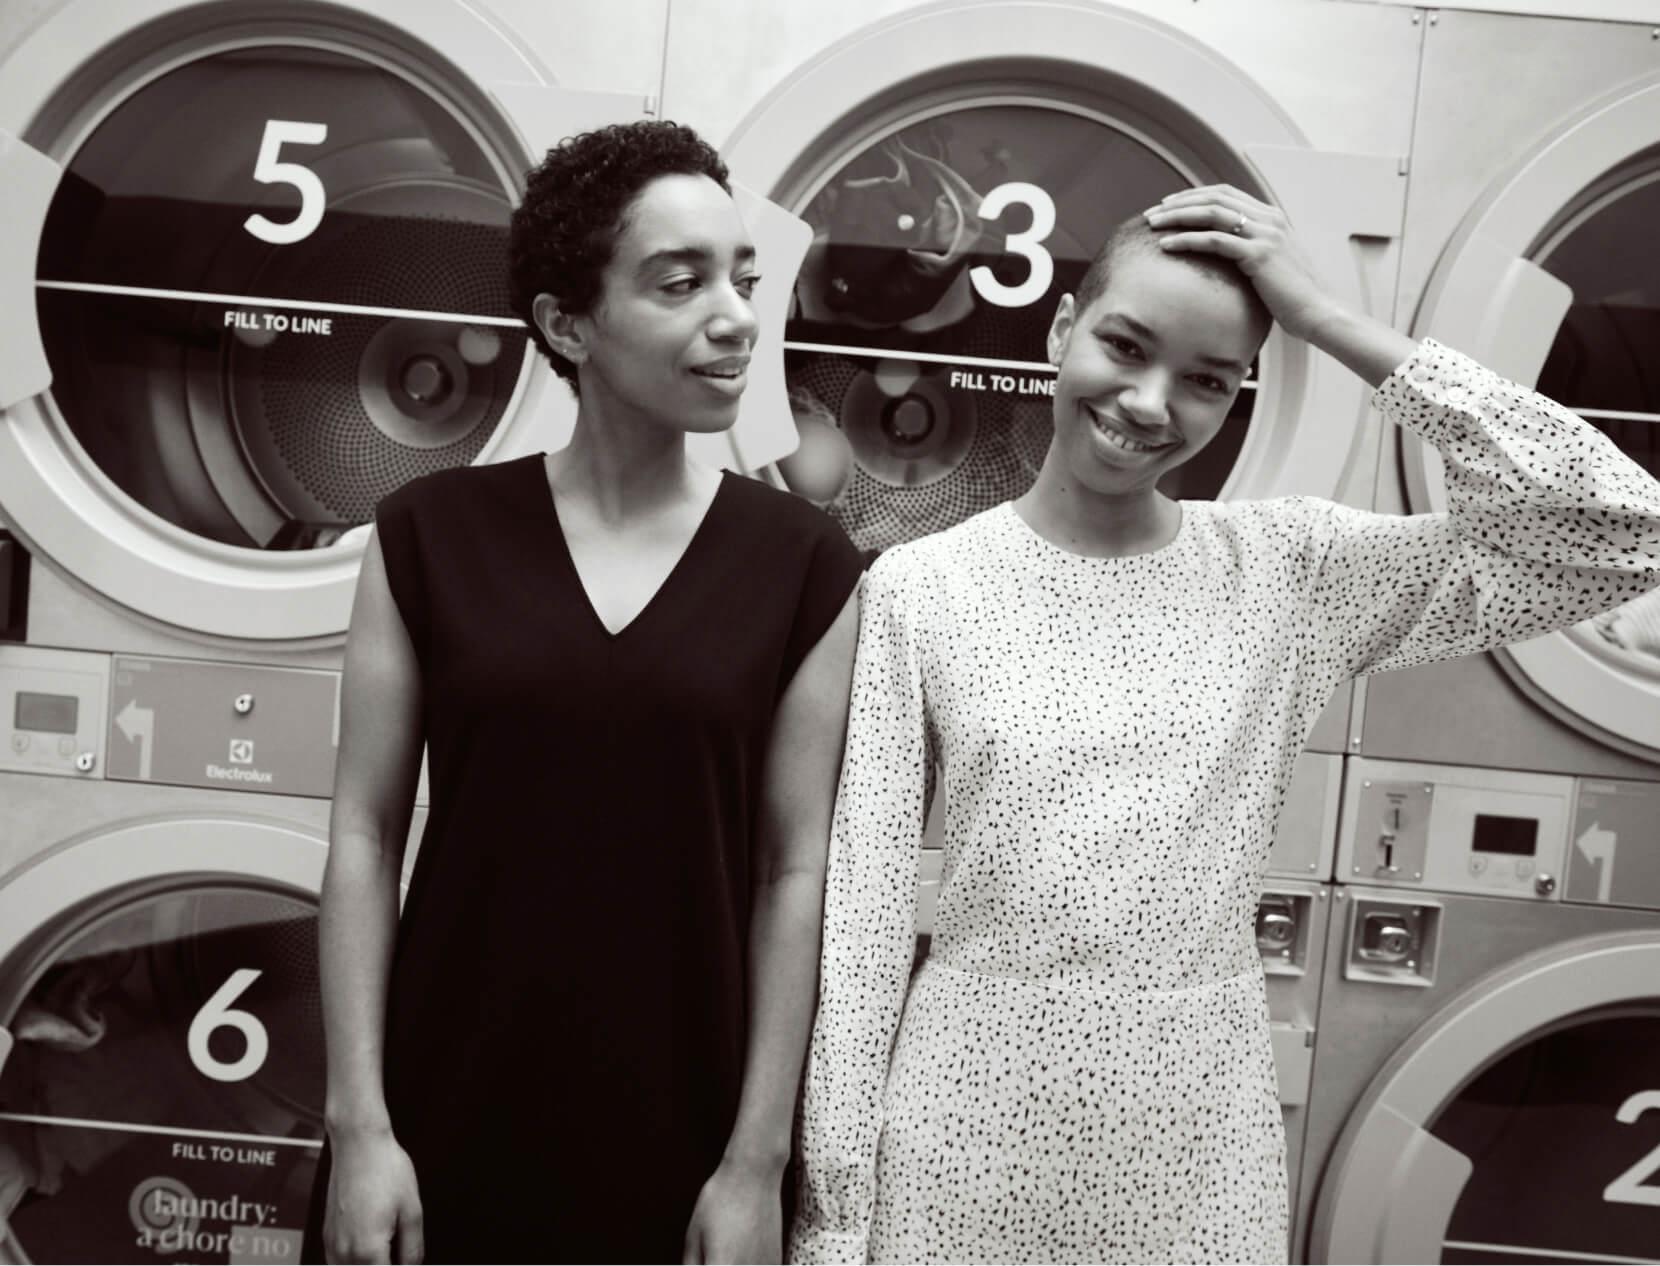 Women in laundromat